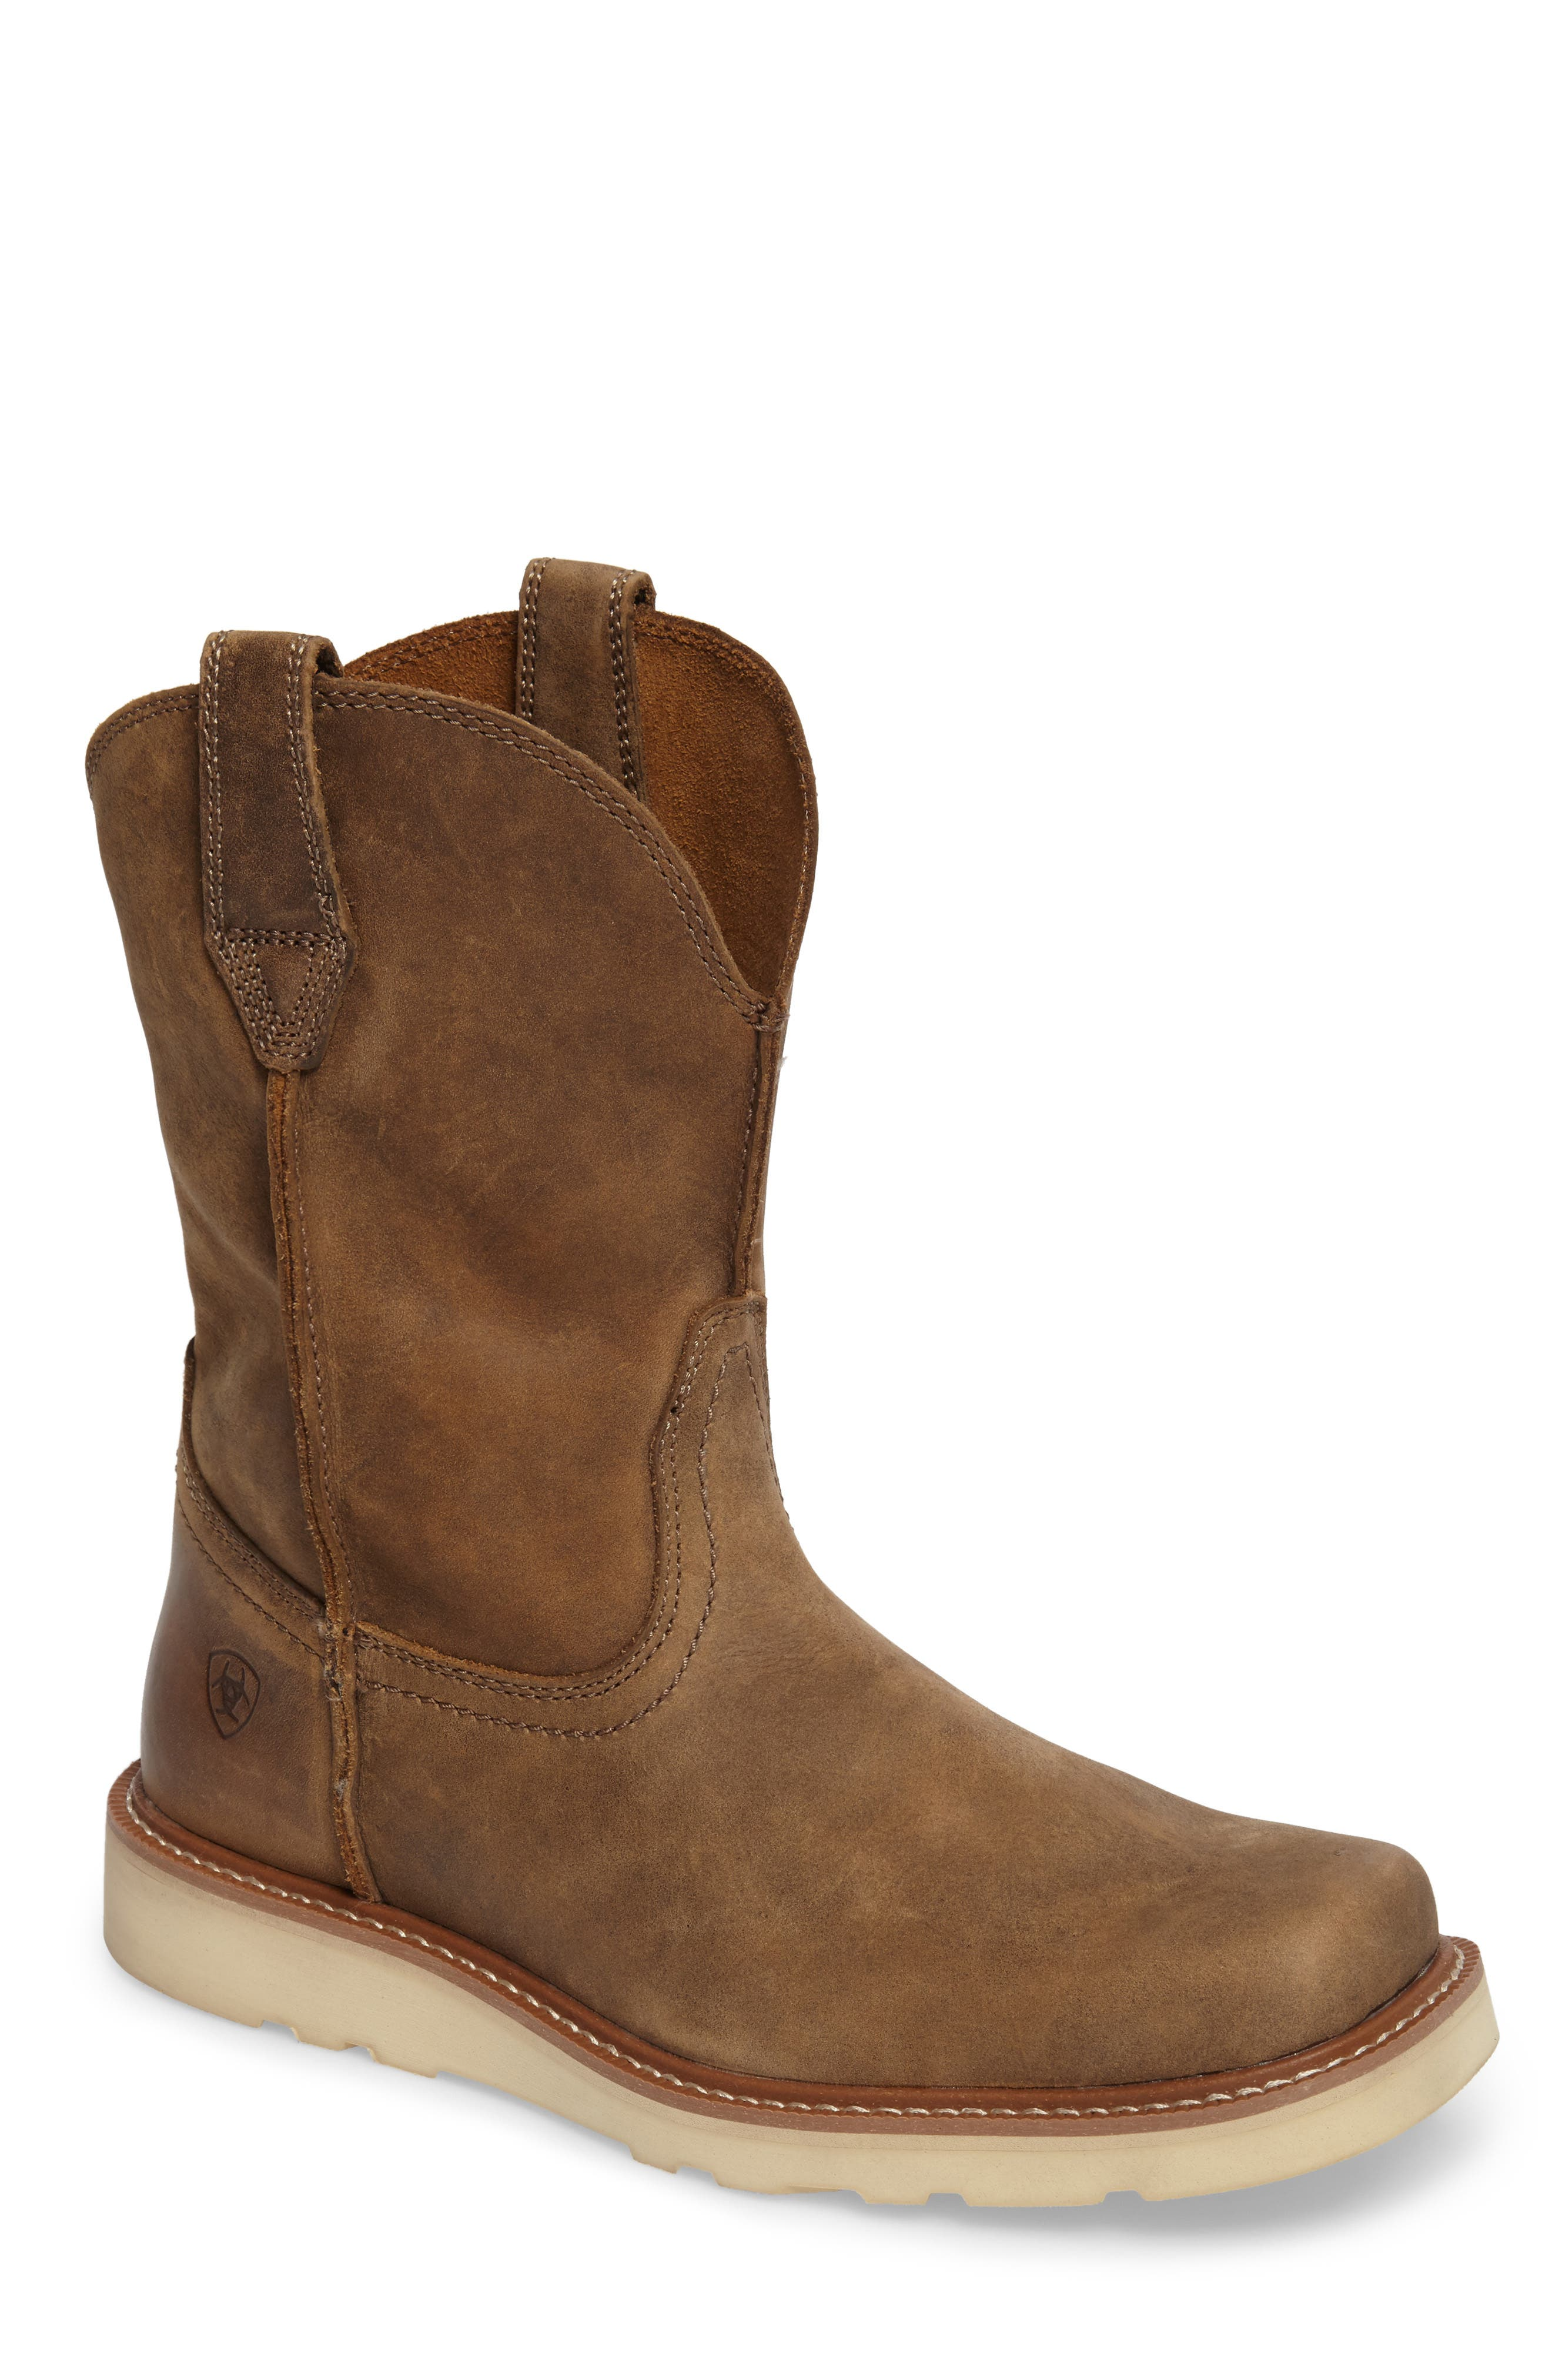 Ariat Rambler Tall Boot, Brown